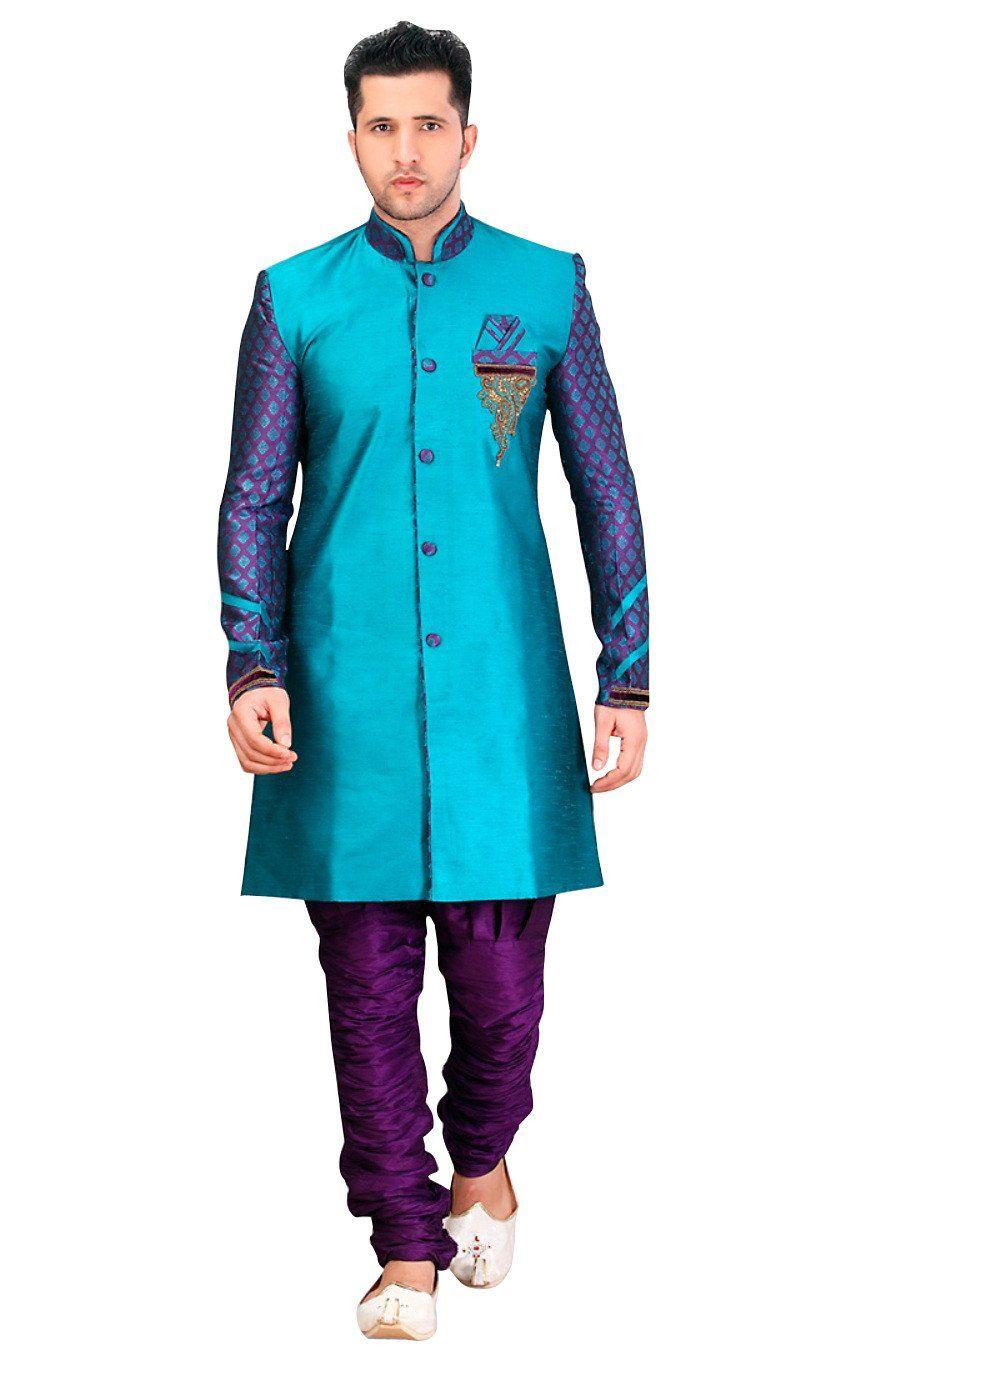 Blue Dupioni Raw Silk Indian Wedding Indo-Western Sherwani For Men ...